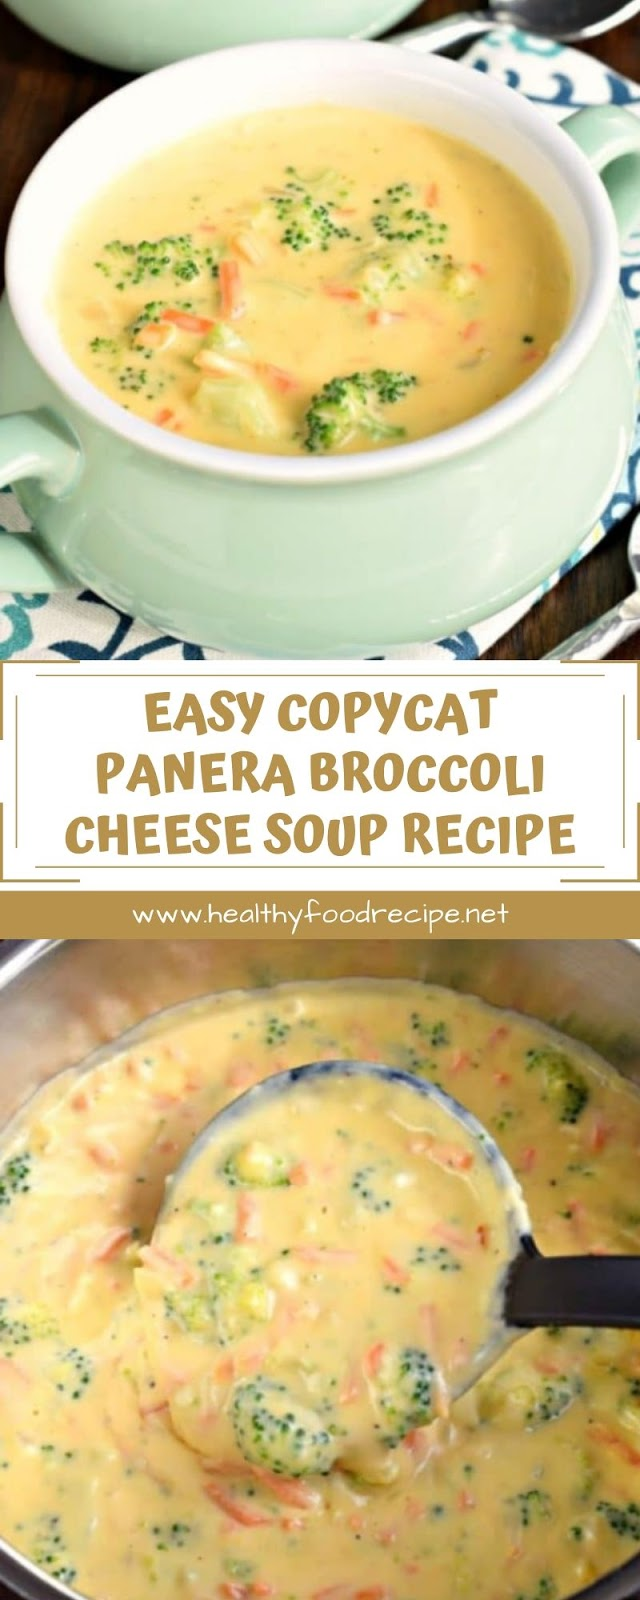 EASY COPYCAT PANERA BROCCOLI CHEESE SOUP RECIPE